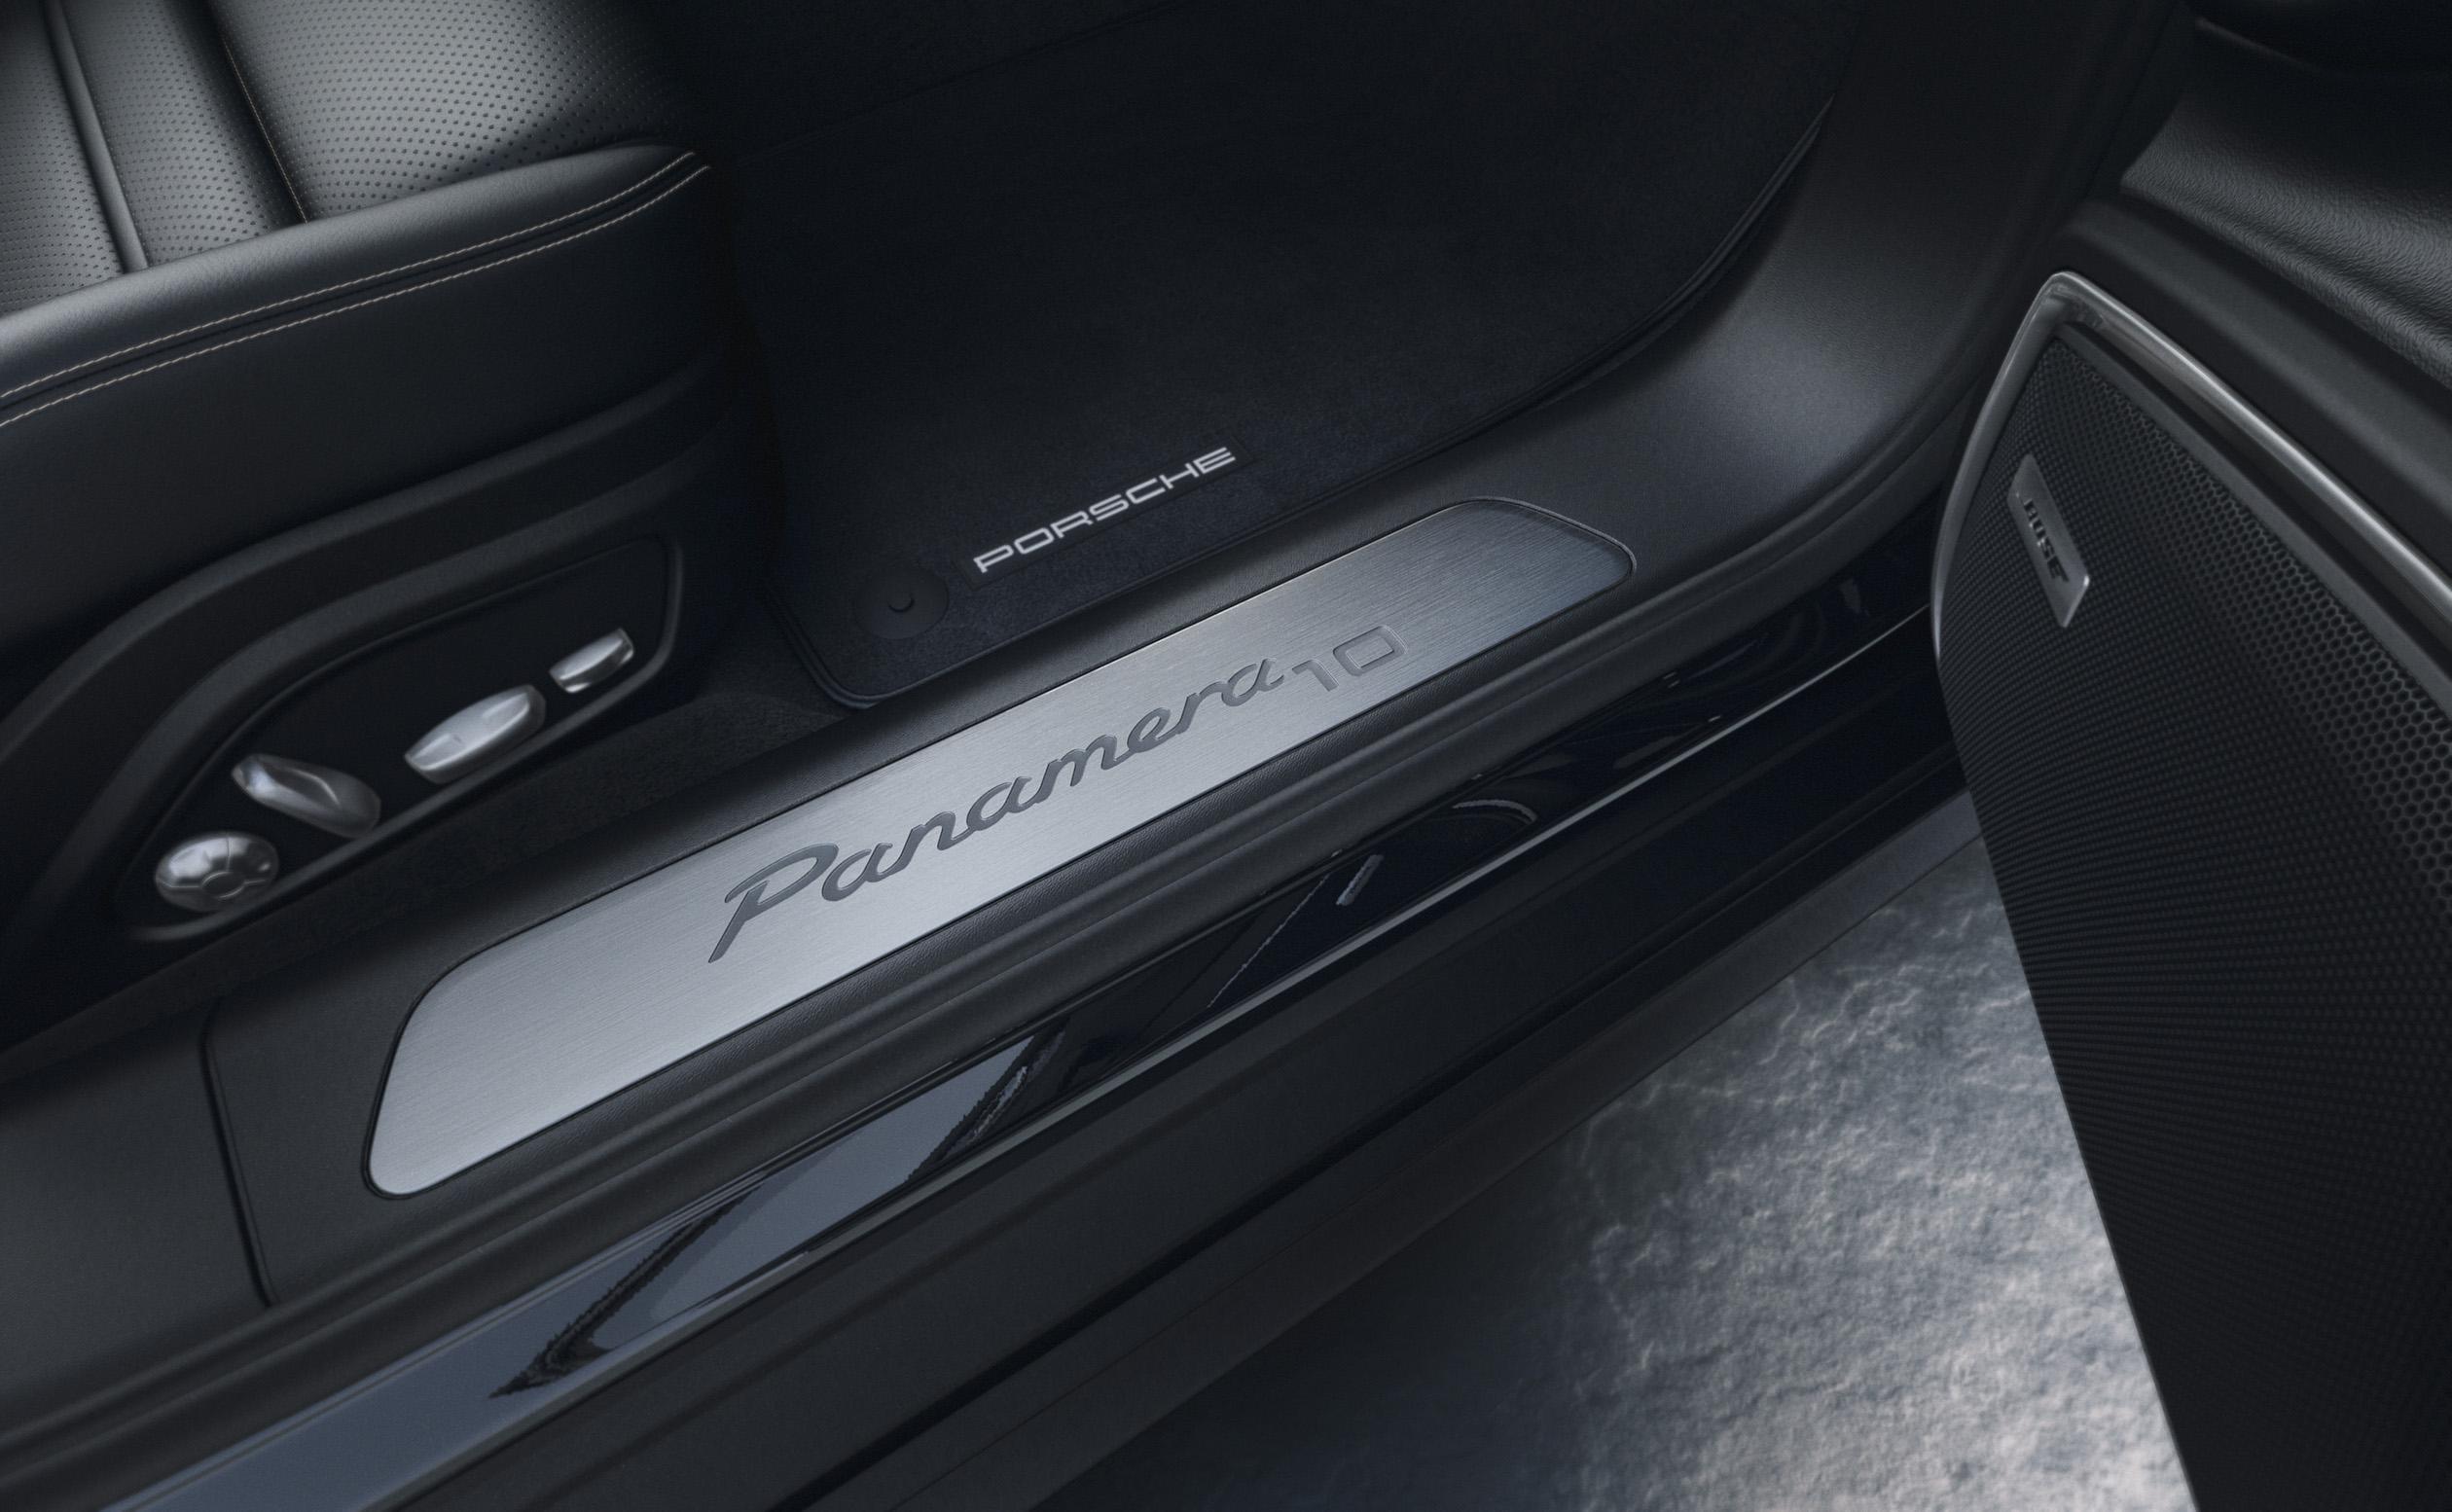 Porsche Panamera 4 10 Years Edition [5]